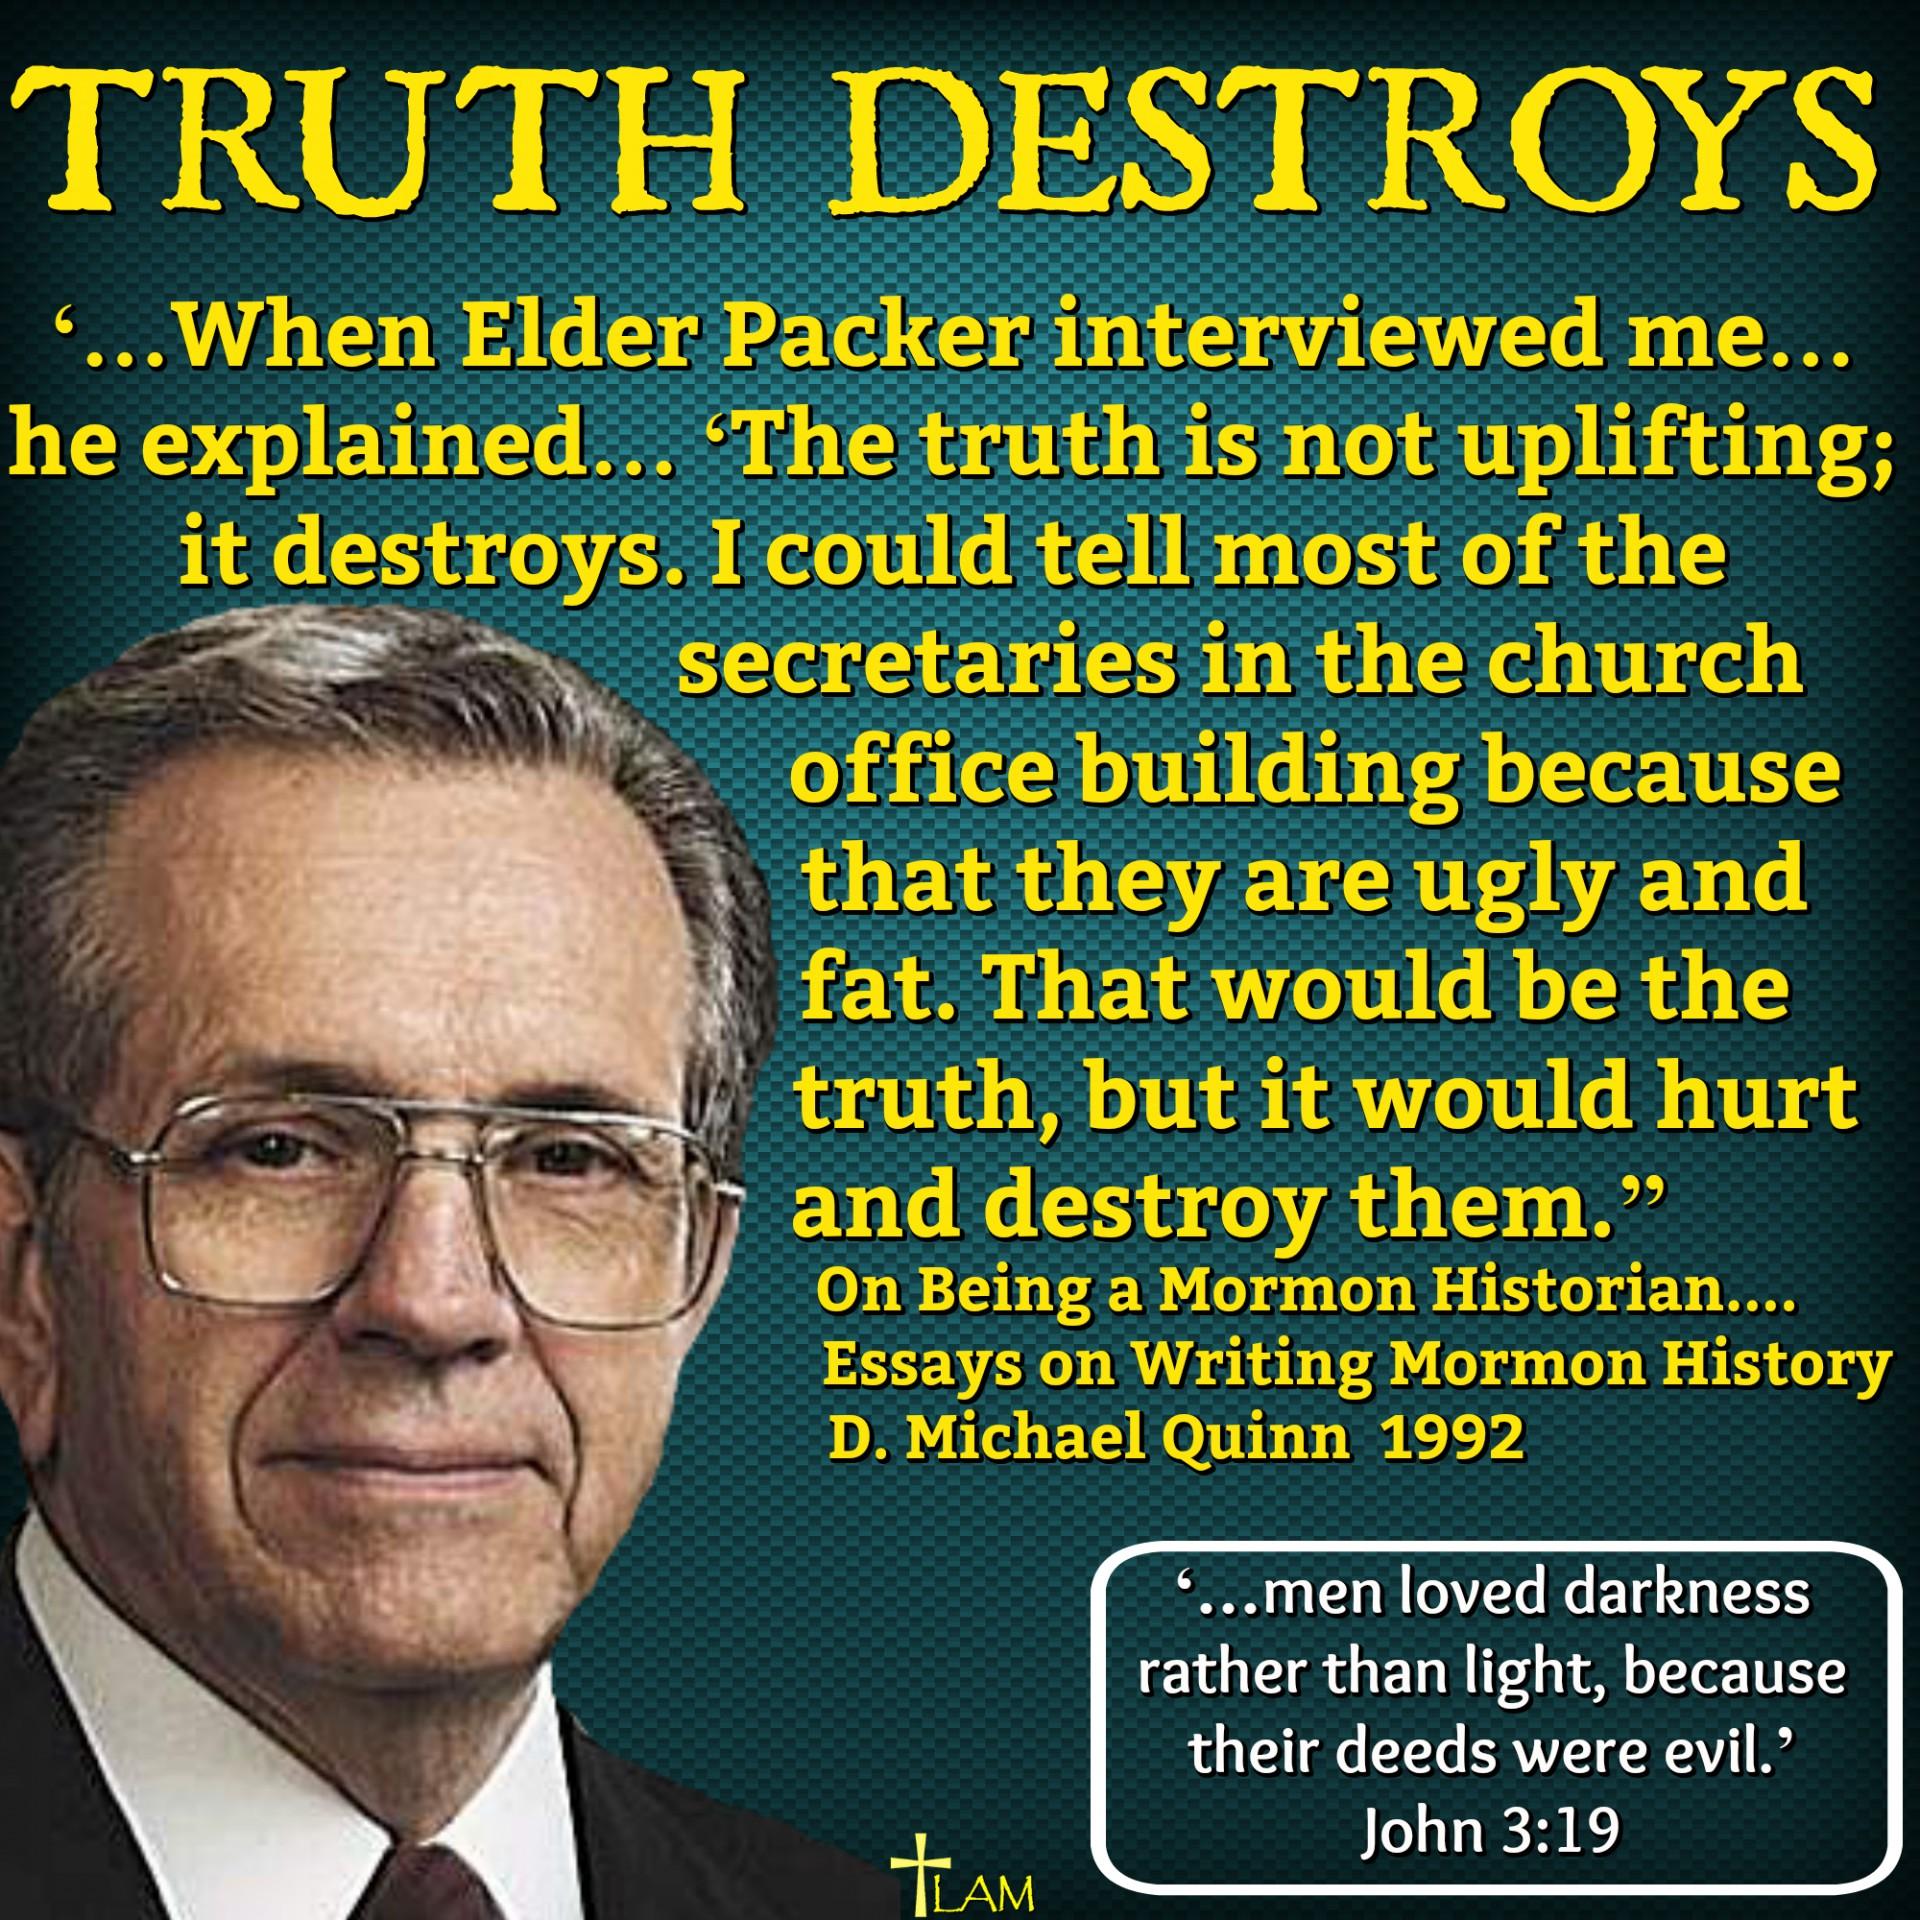 010 Truth Destroys Lds Essays Essay Unbelievable Seer Stone Mother In Heaven Joseph Smith 1920